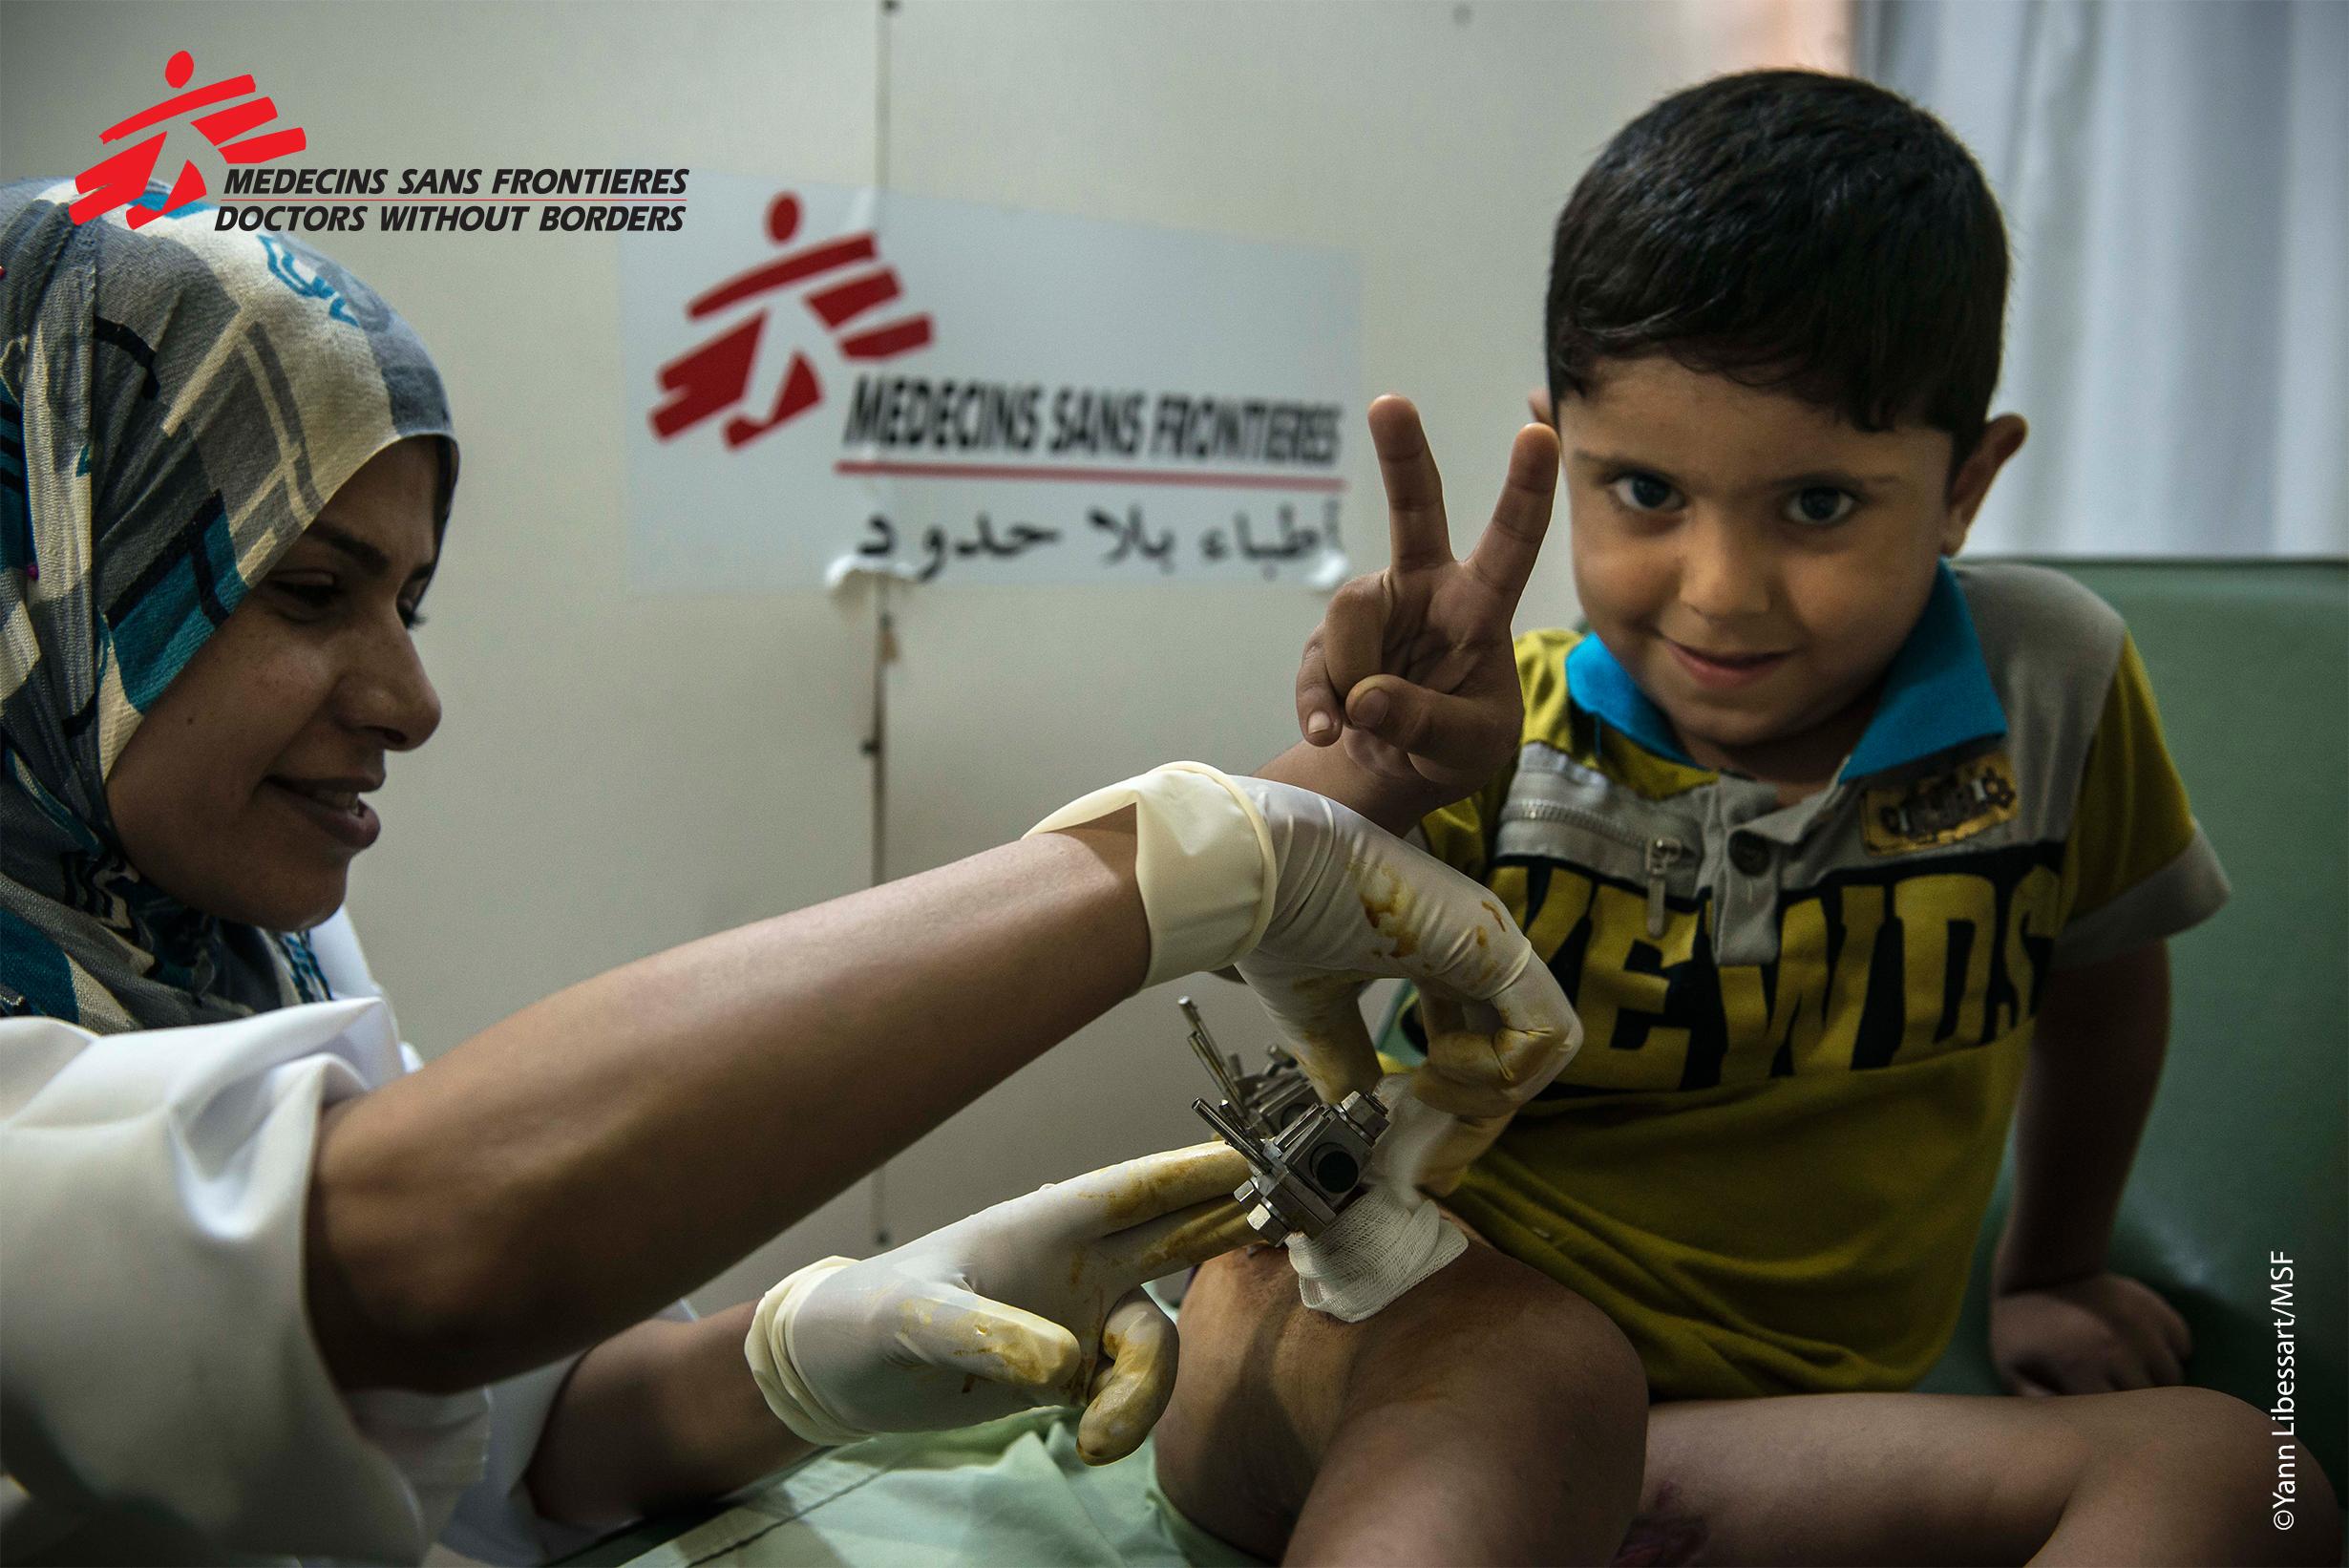 Gaza patients and staff in post-op, copyright Yann Libessart.jpg